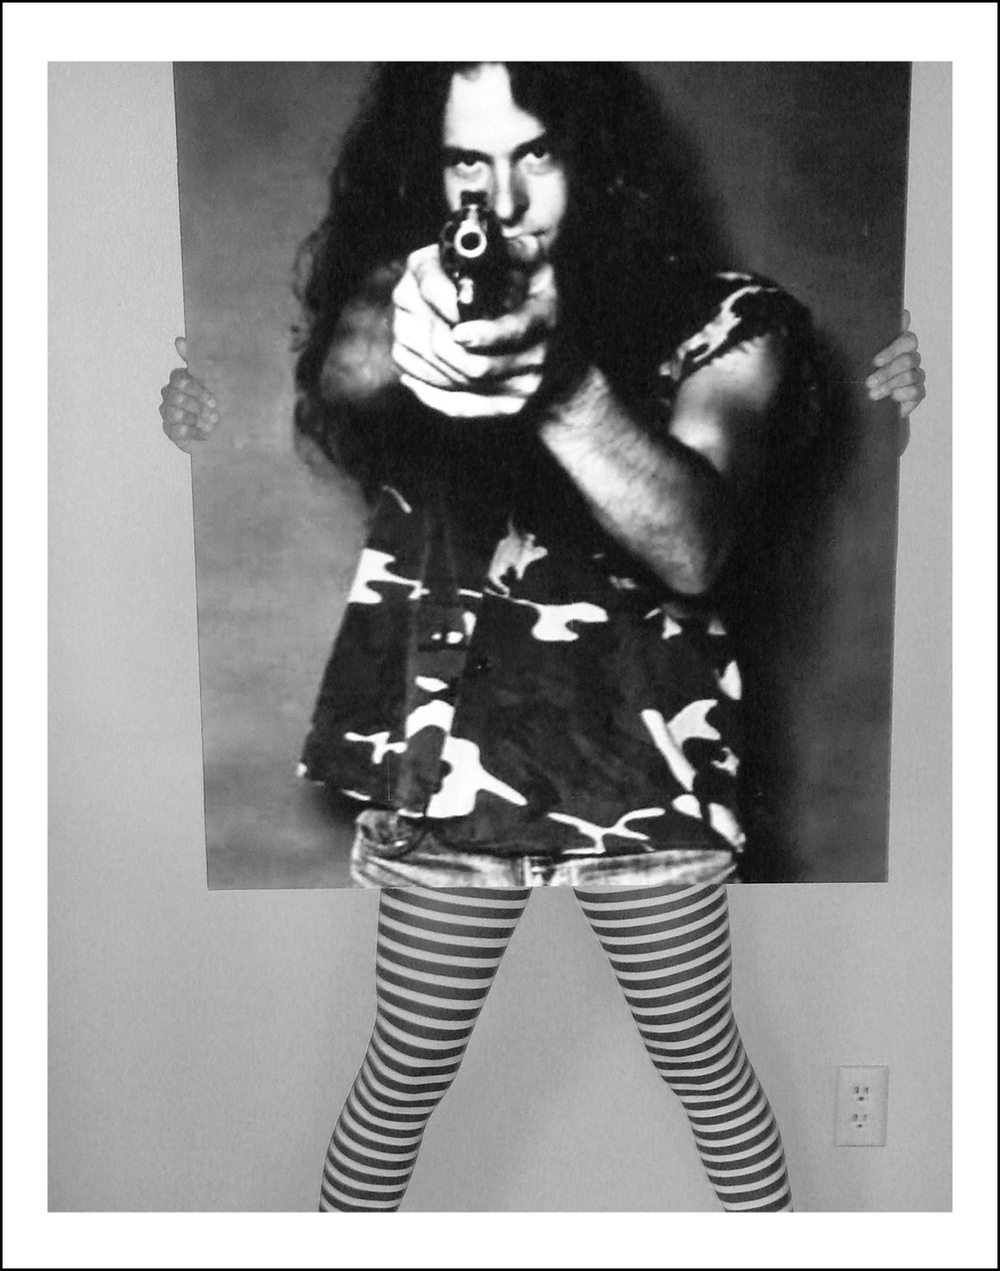 Carlee Fernandez Self Portrait as Ted Nugent